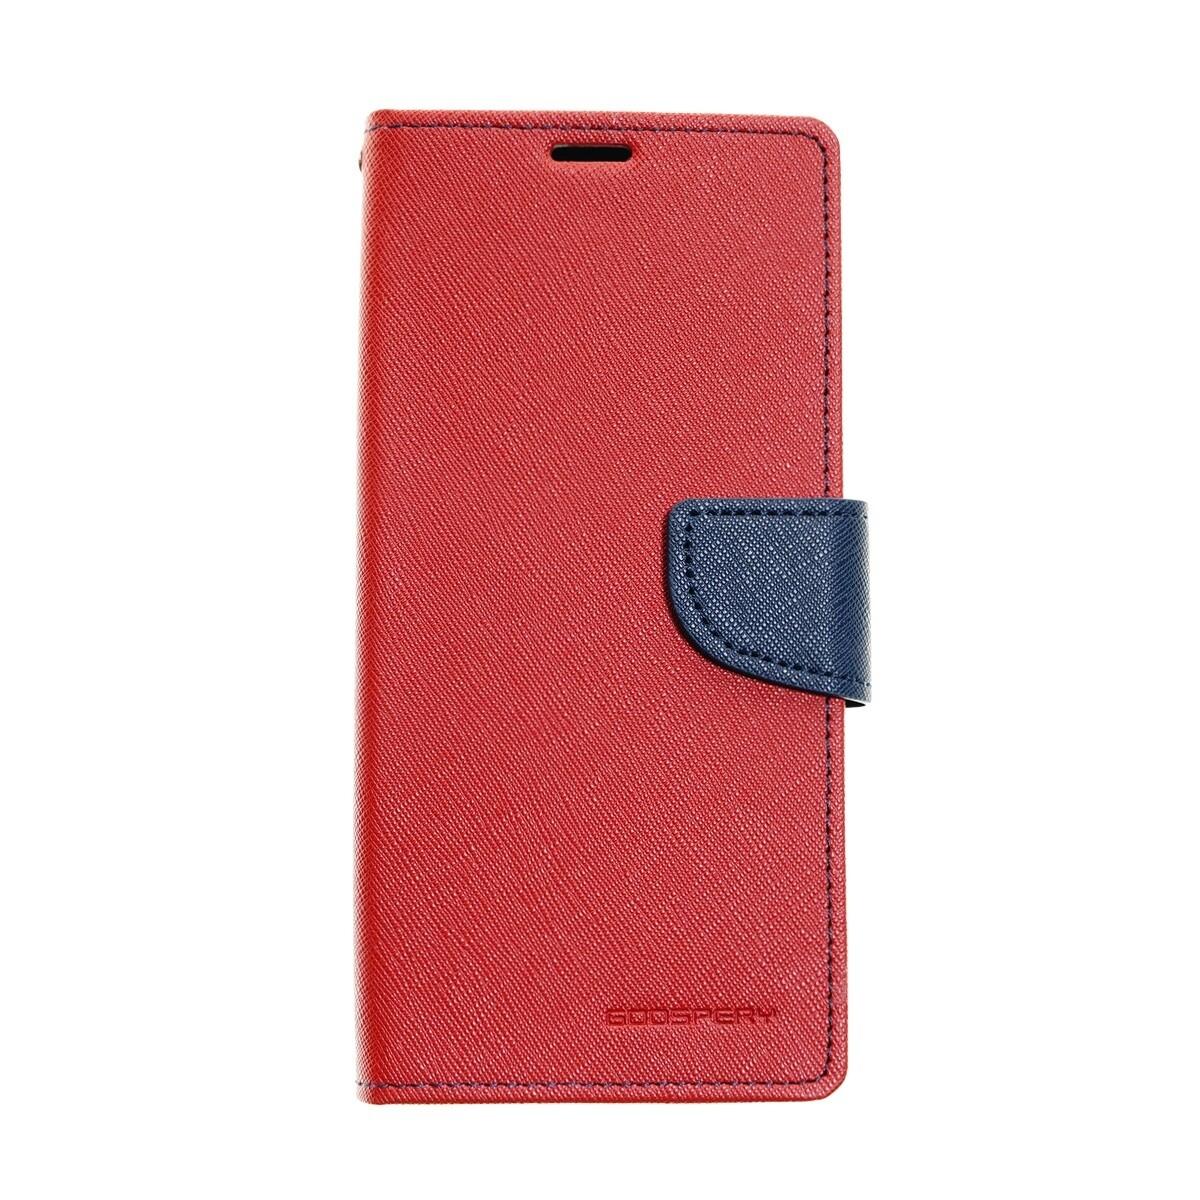 Estuche GOOSPERY Fancy Diary Rojo/Azul Marino IPHONE XS MAX (6.5)